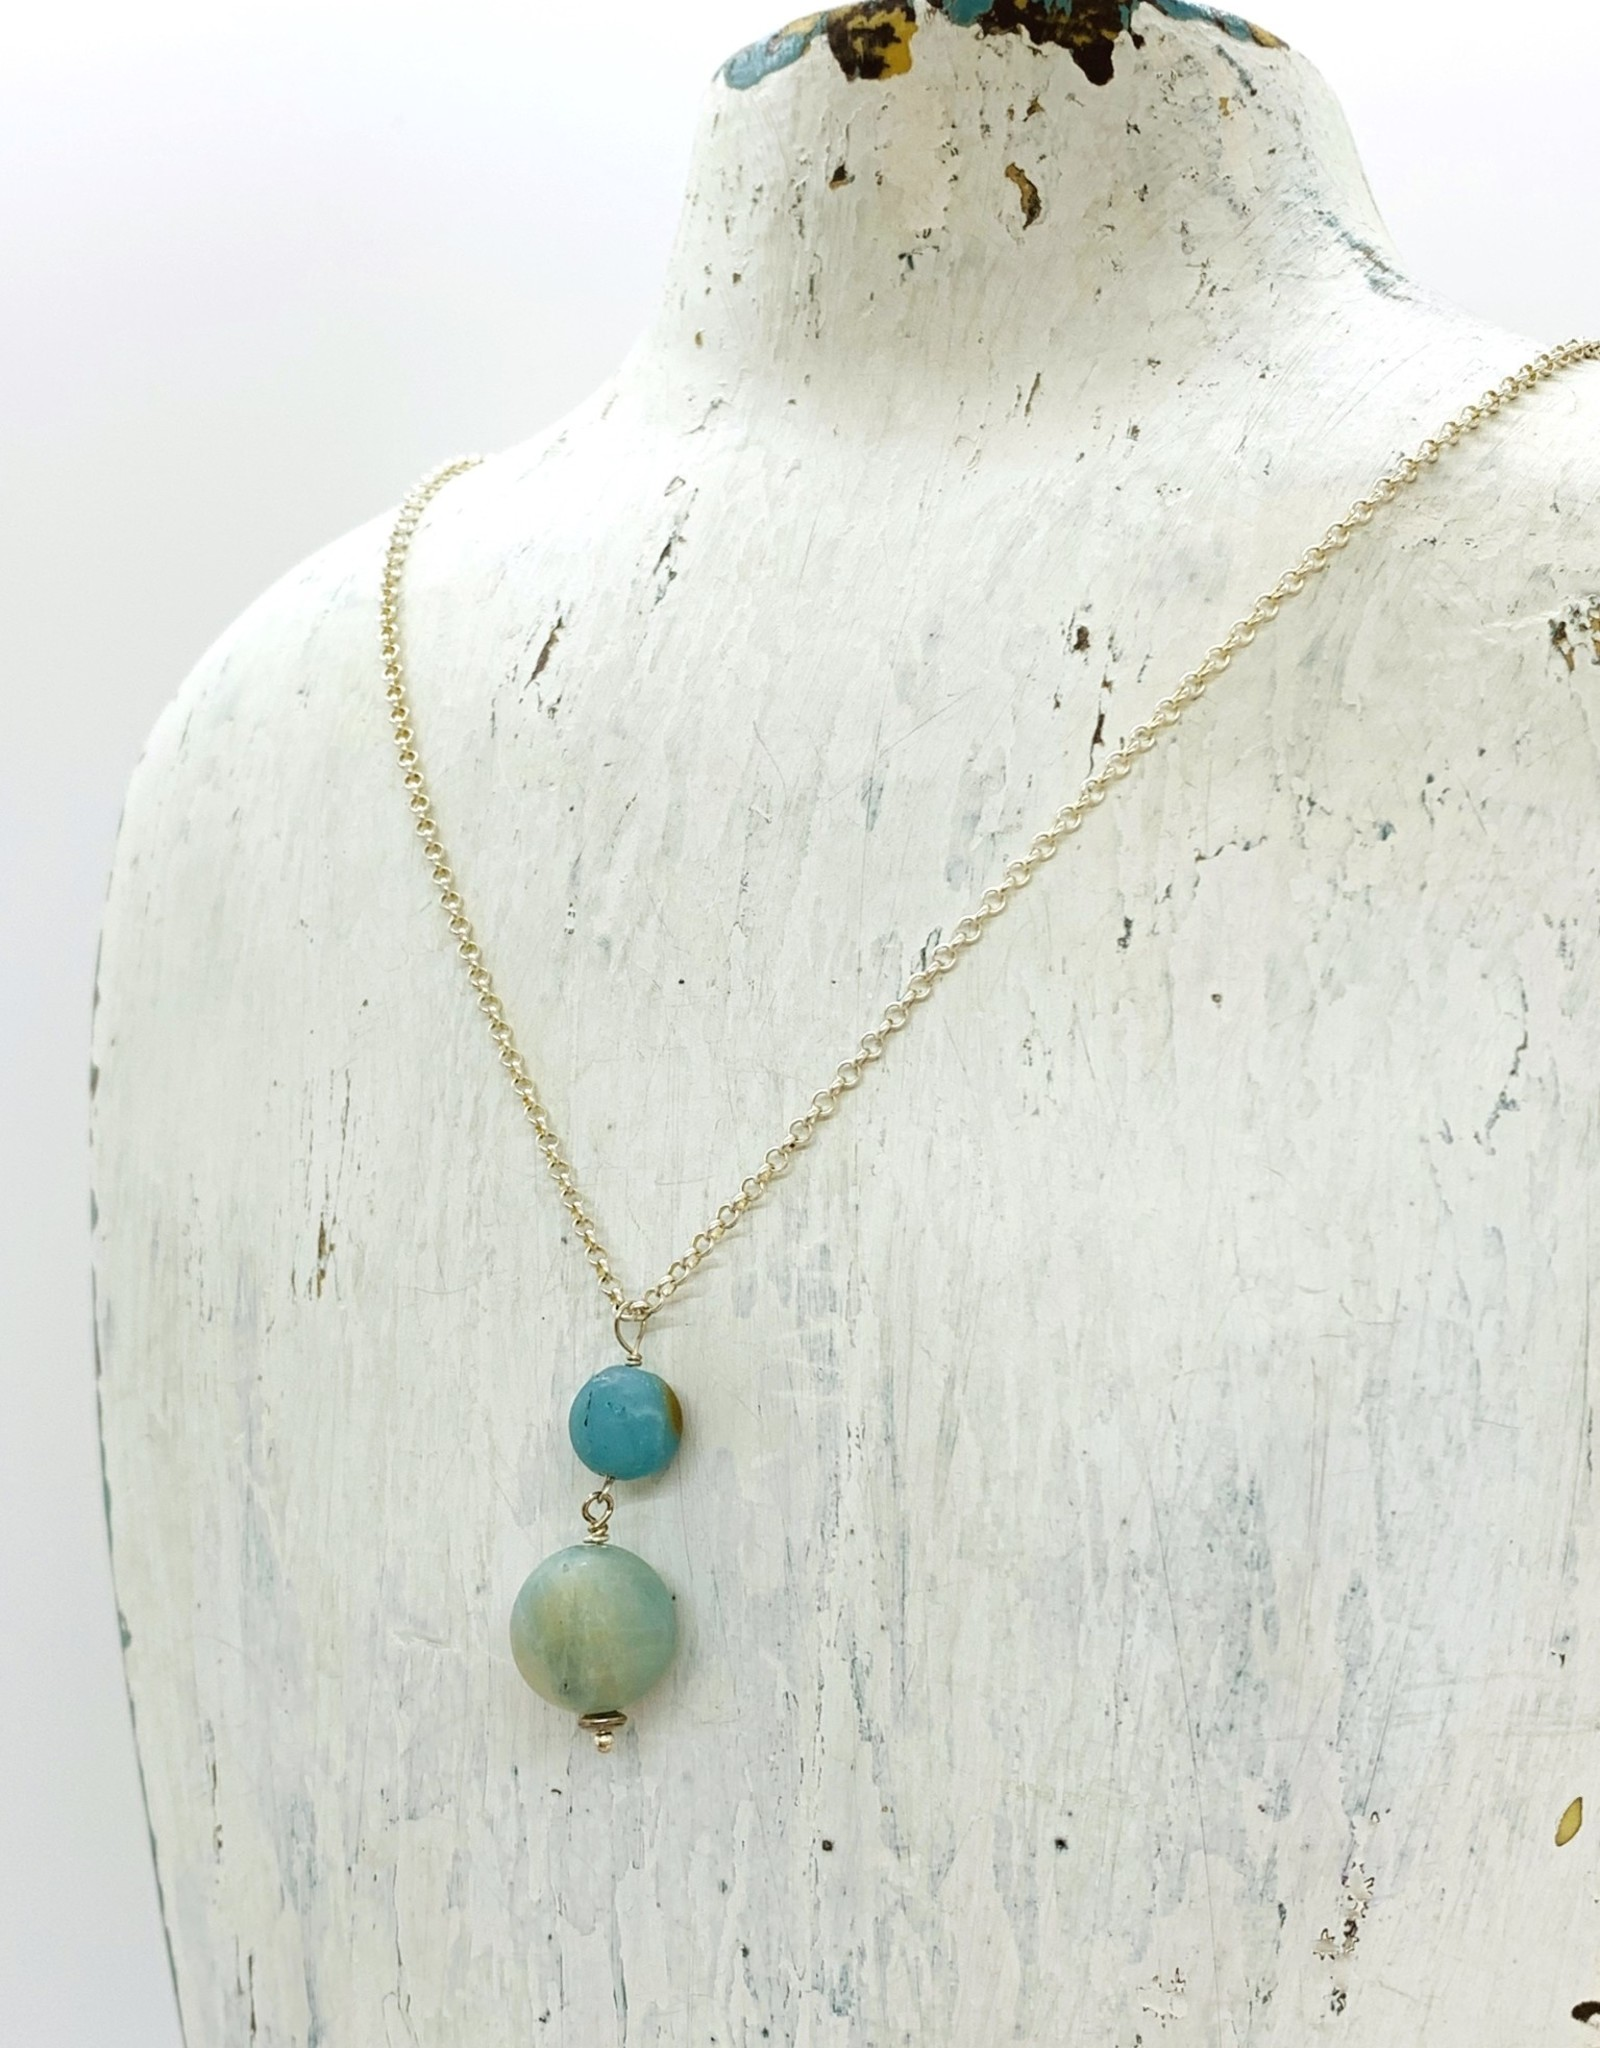 Handmade Silver Necklace with medium matte amazonite,large matte amazonite, shiny